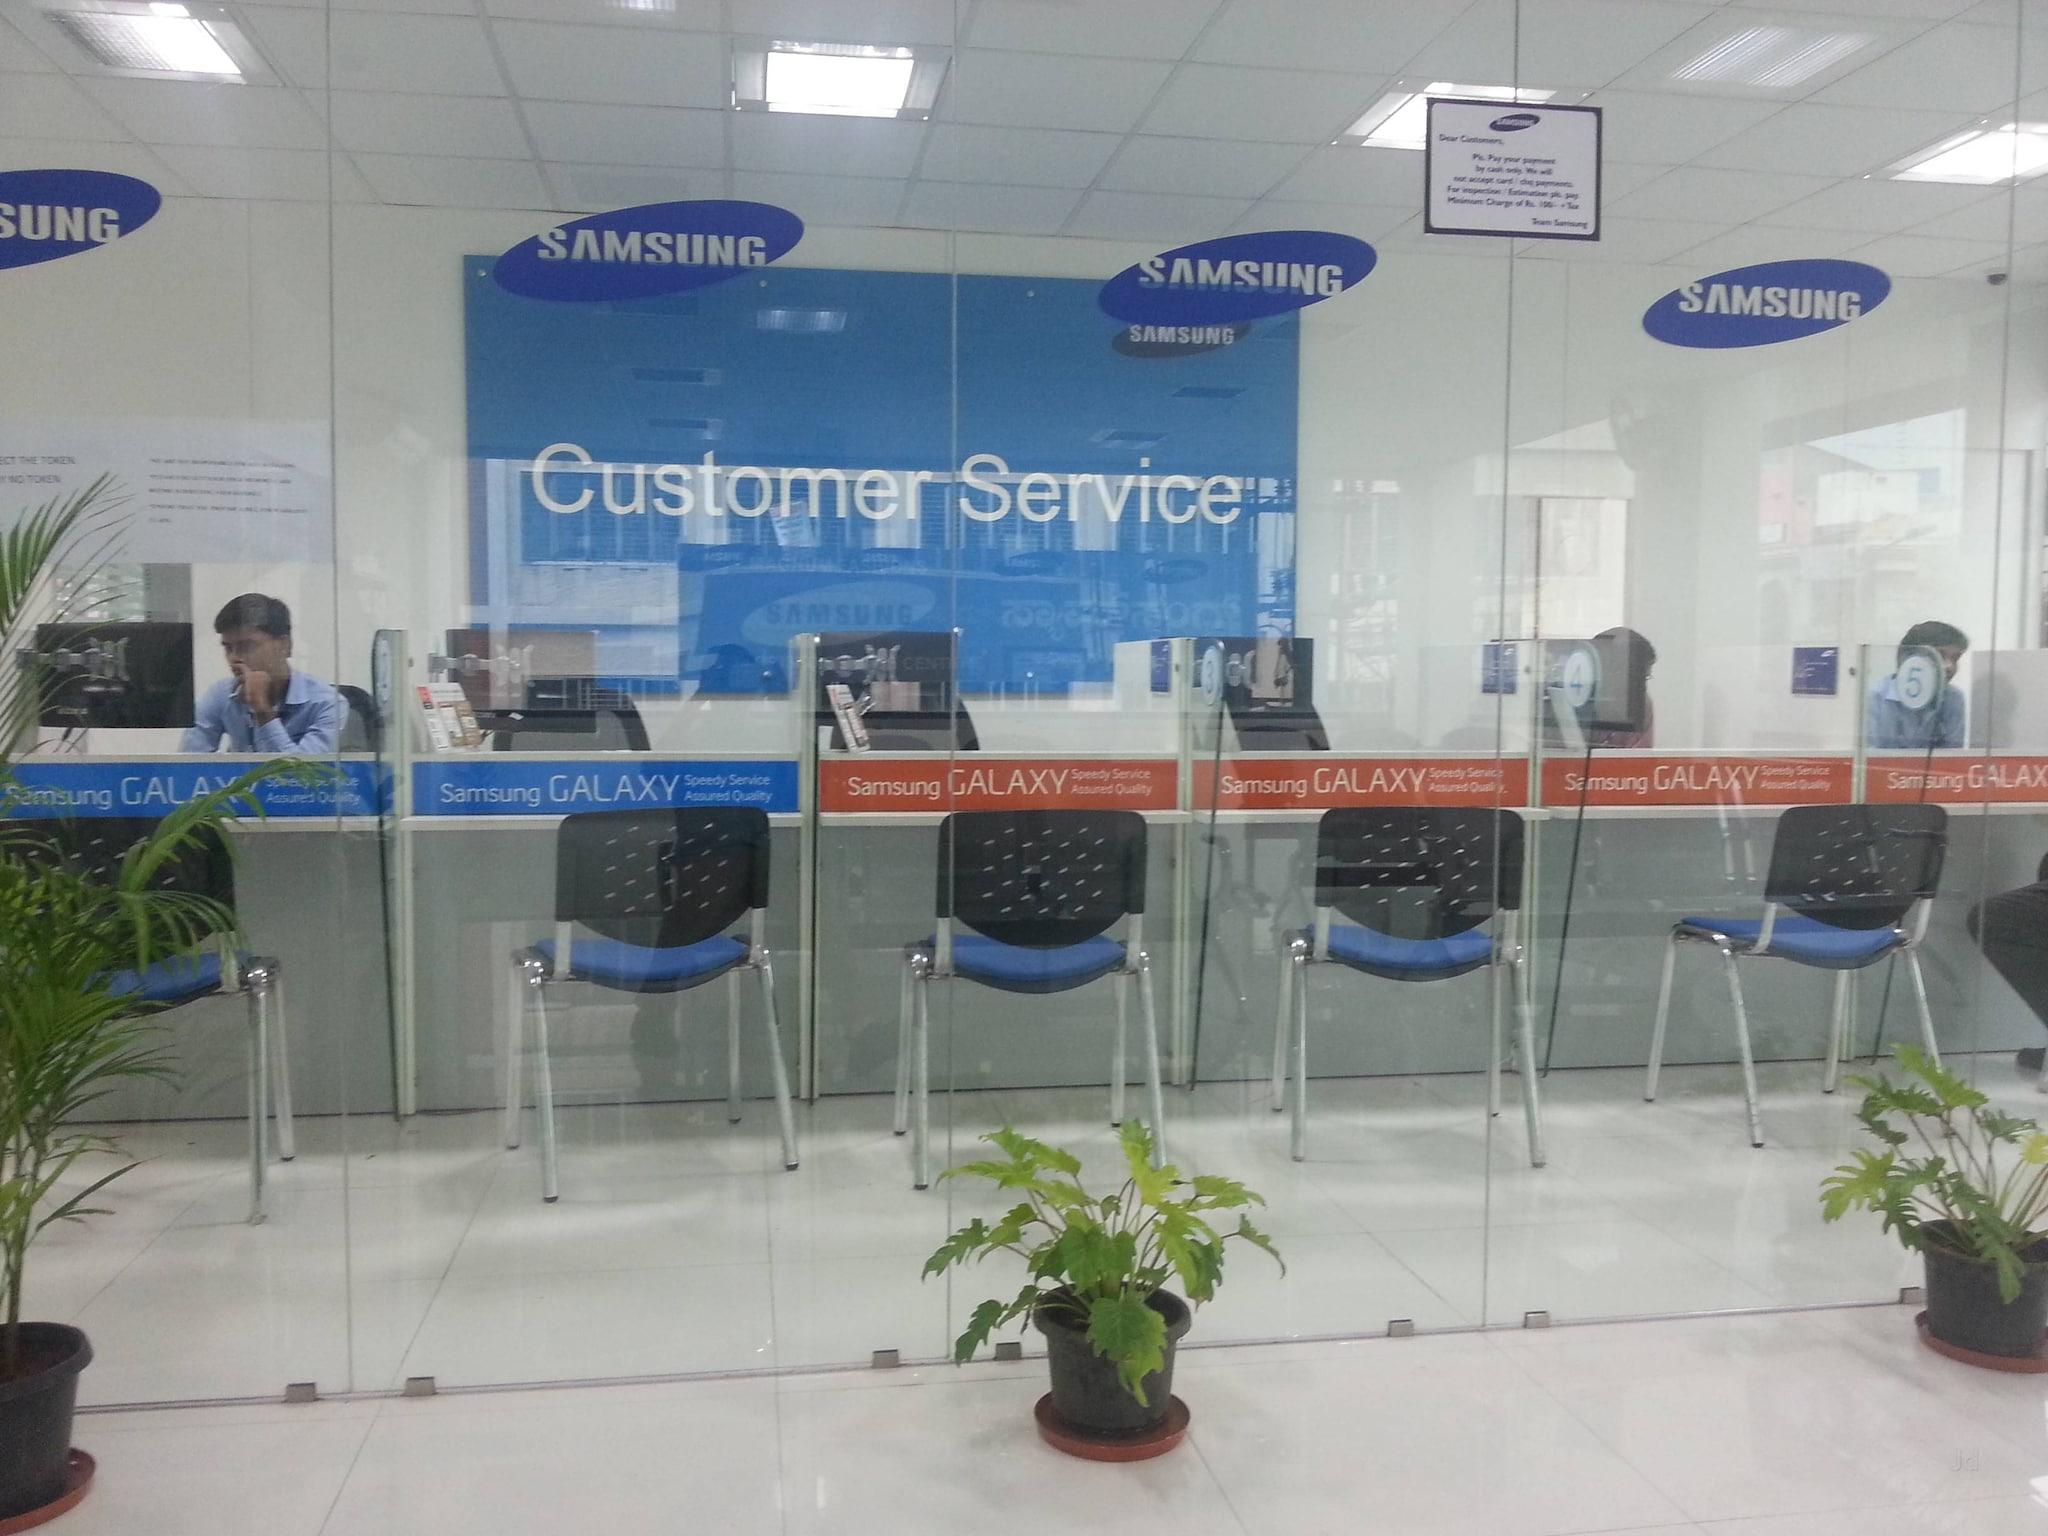 wedding card printers in bangalore indiranagar%0A Samsung Authorised Service Centre  Indiranagar  Mobile Phone Repair  u      Services in Bangalore  Justdial